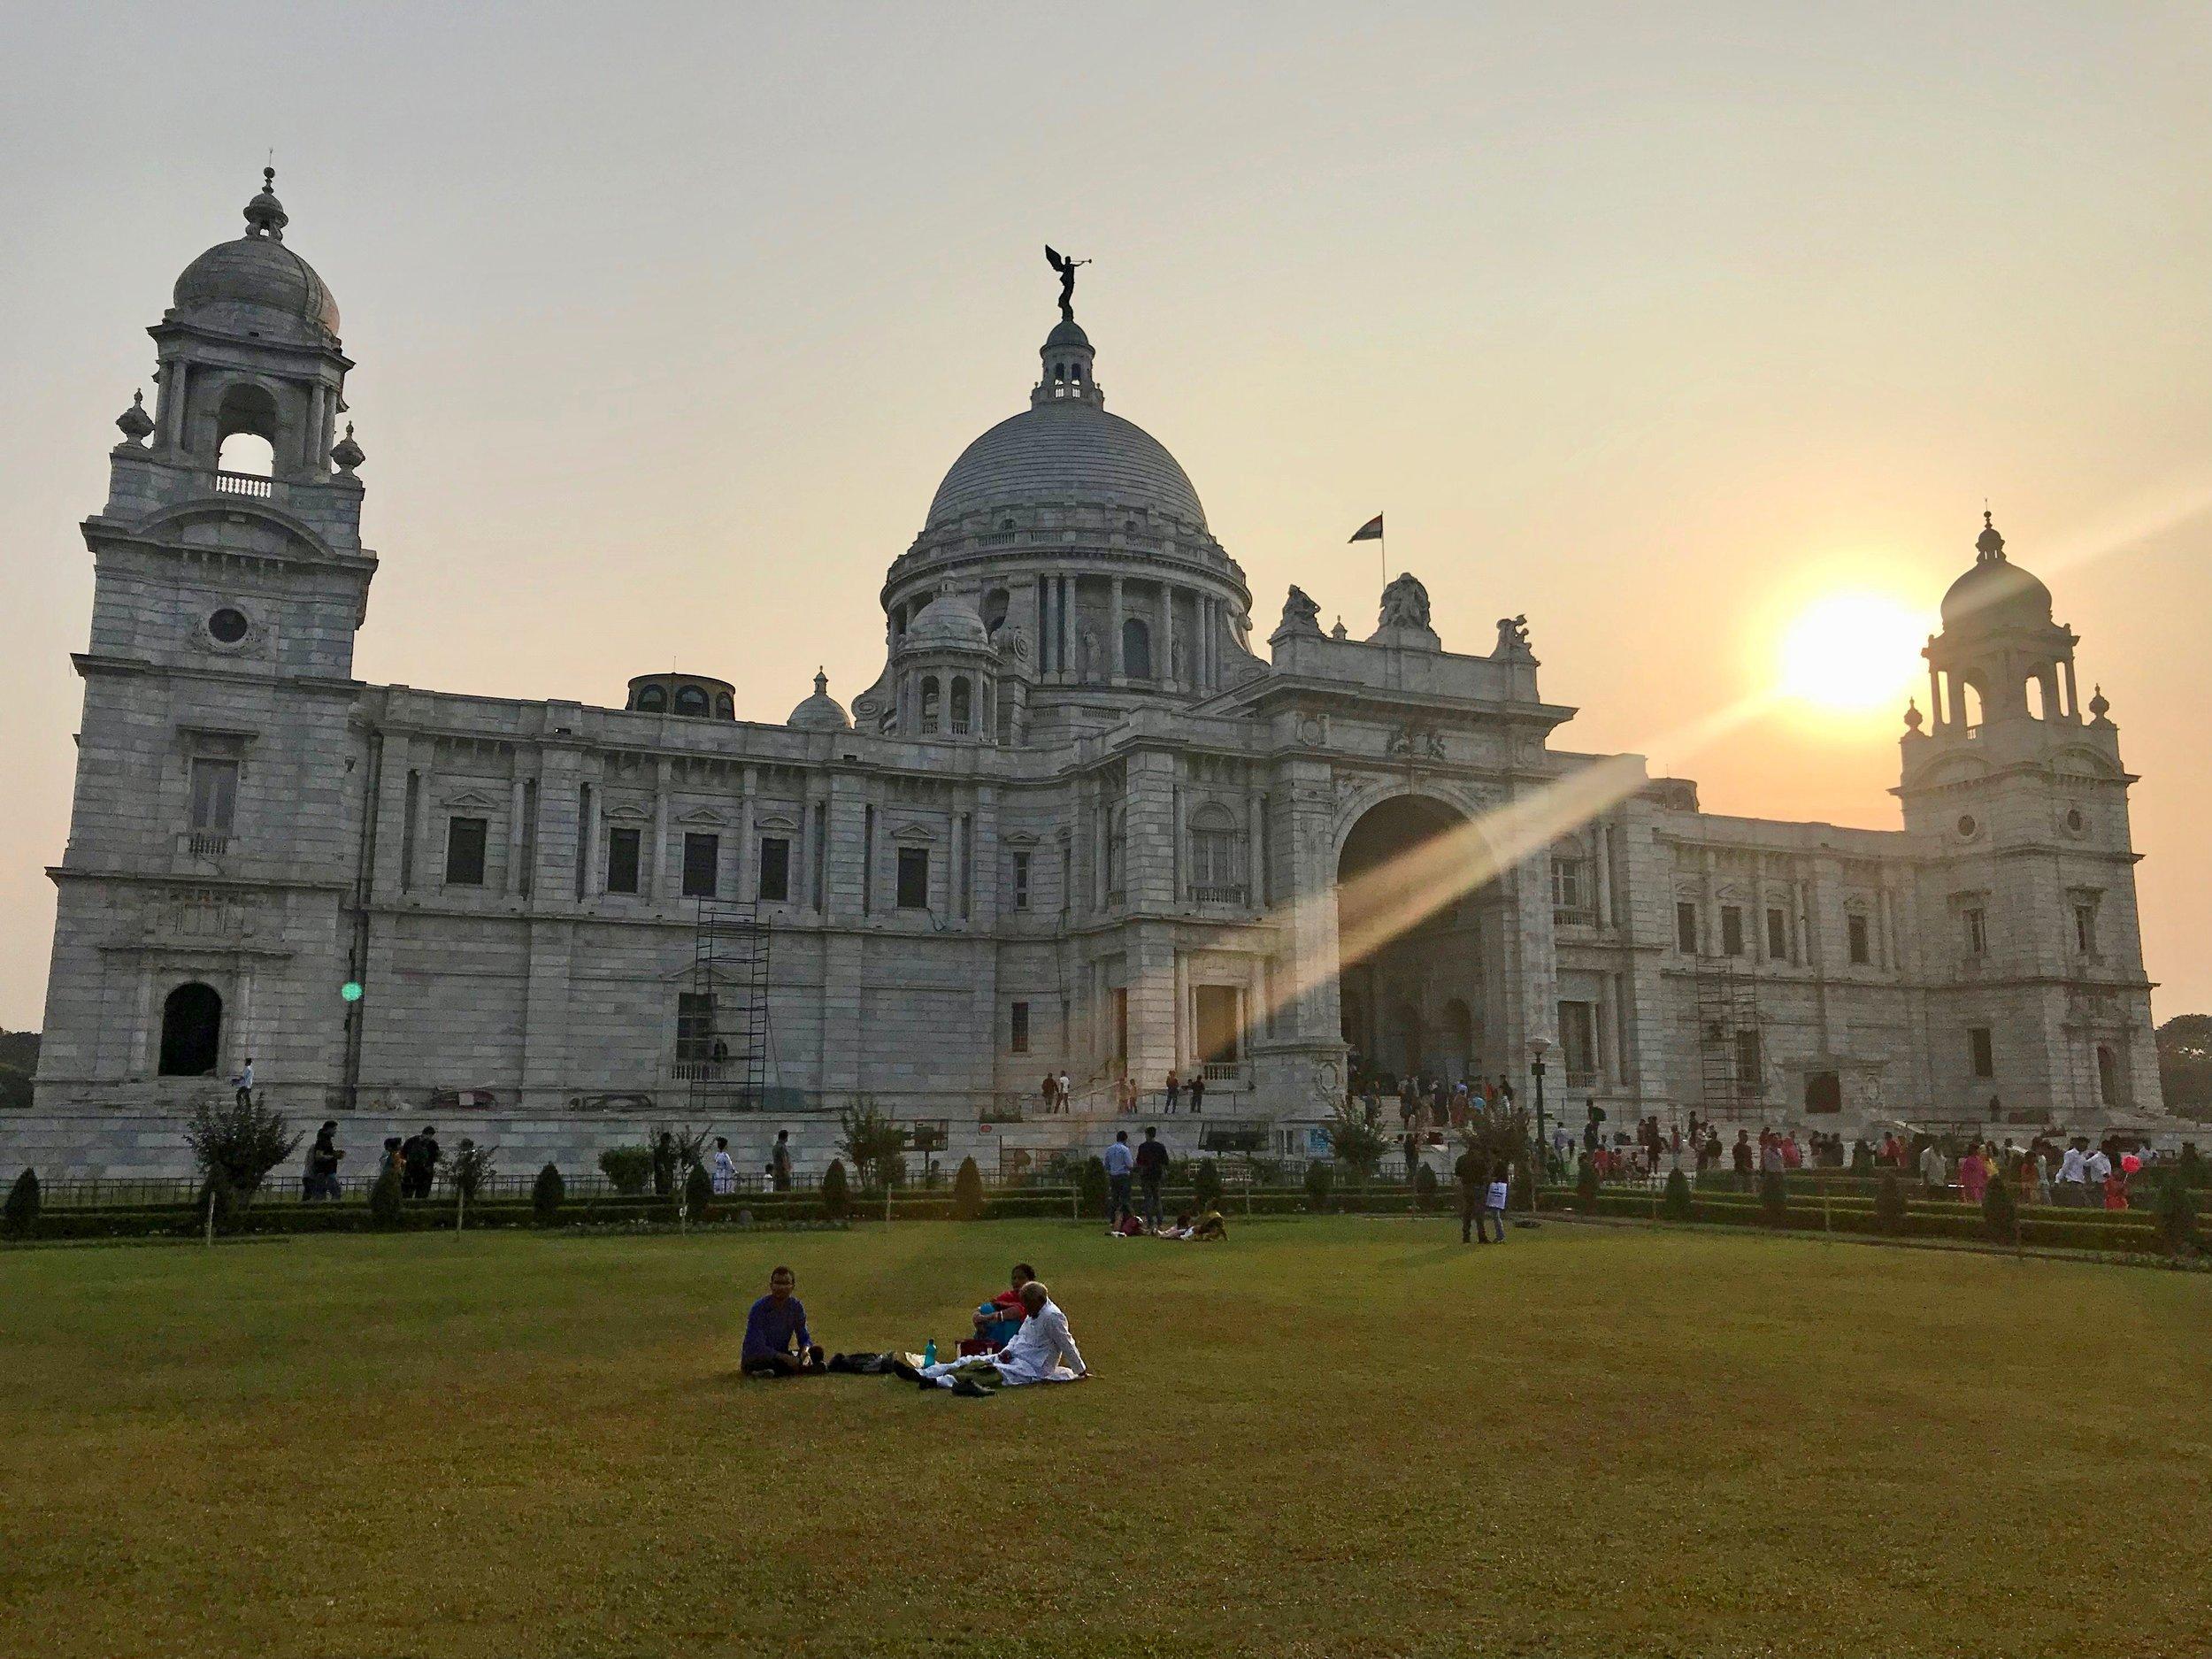 Calcutta (11 au 13 décembre)_22.jpg